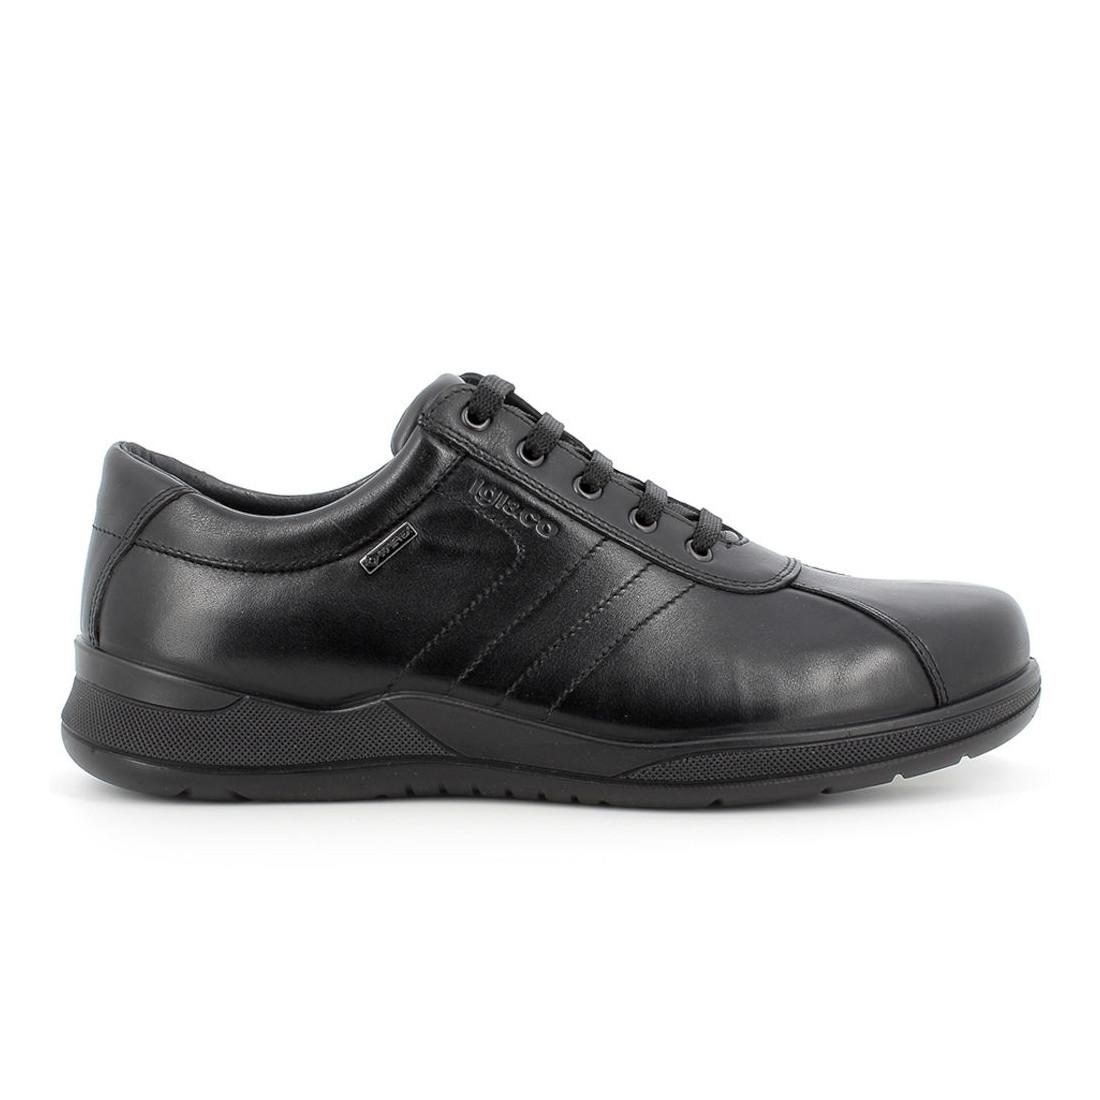 sneakers uomo igico berny6119200 7948